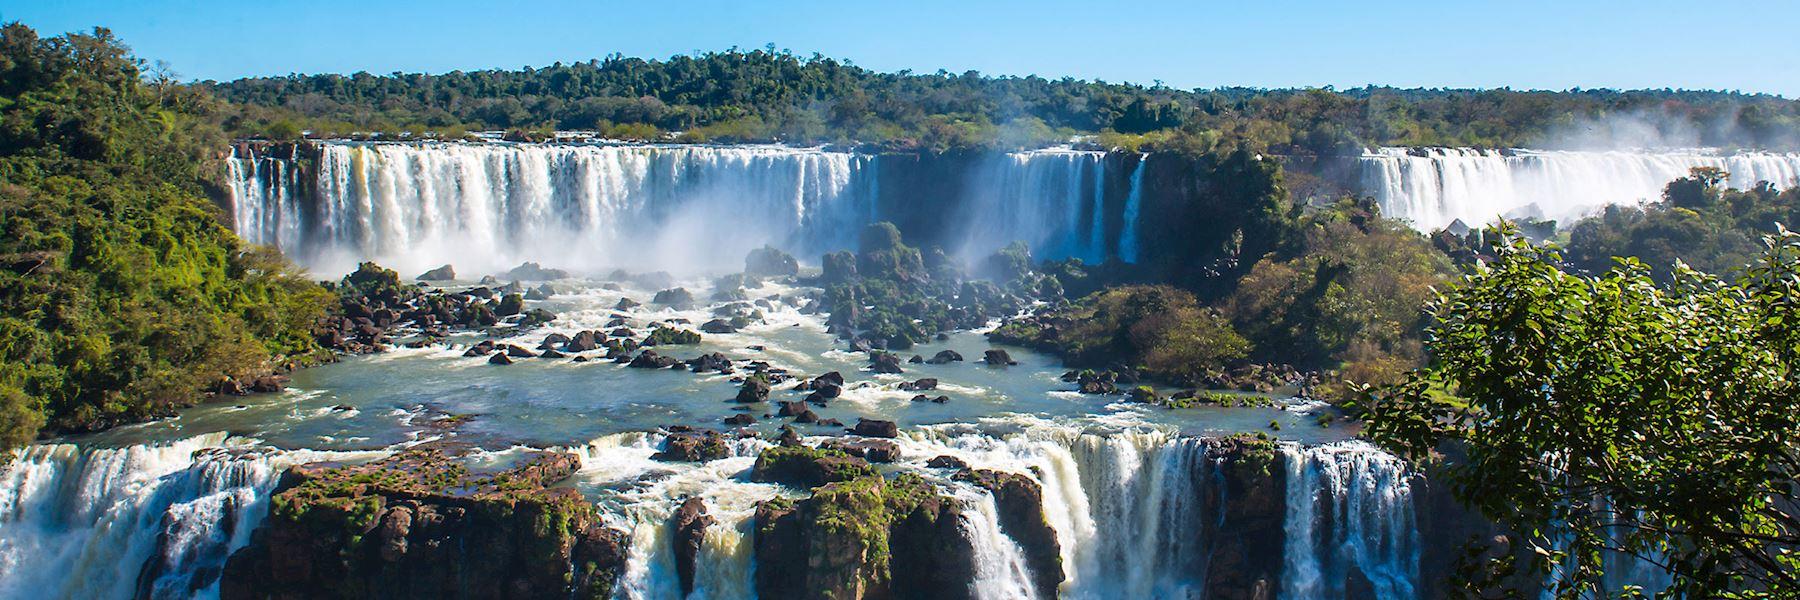 Brazil trip ideas